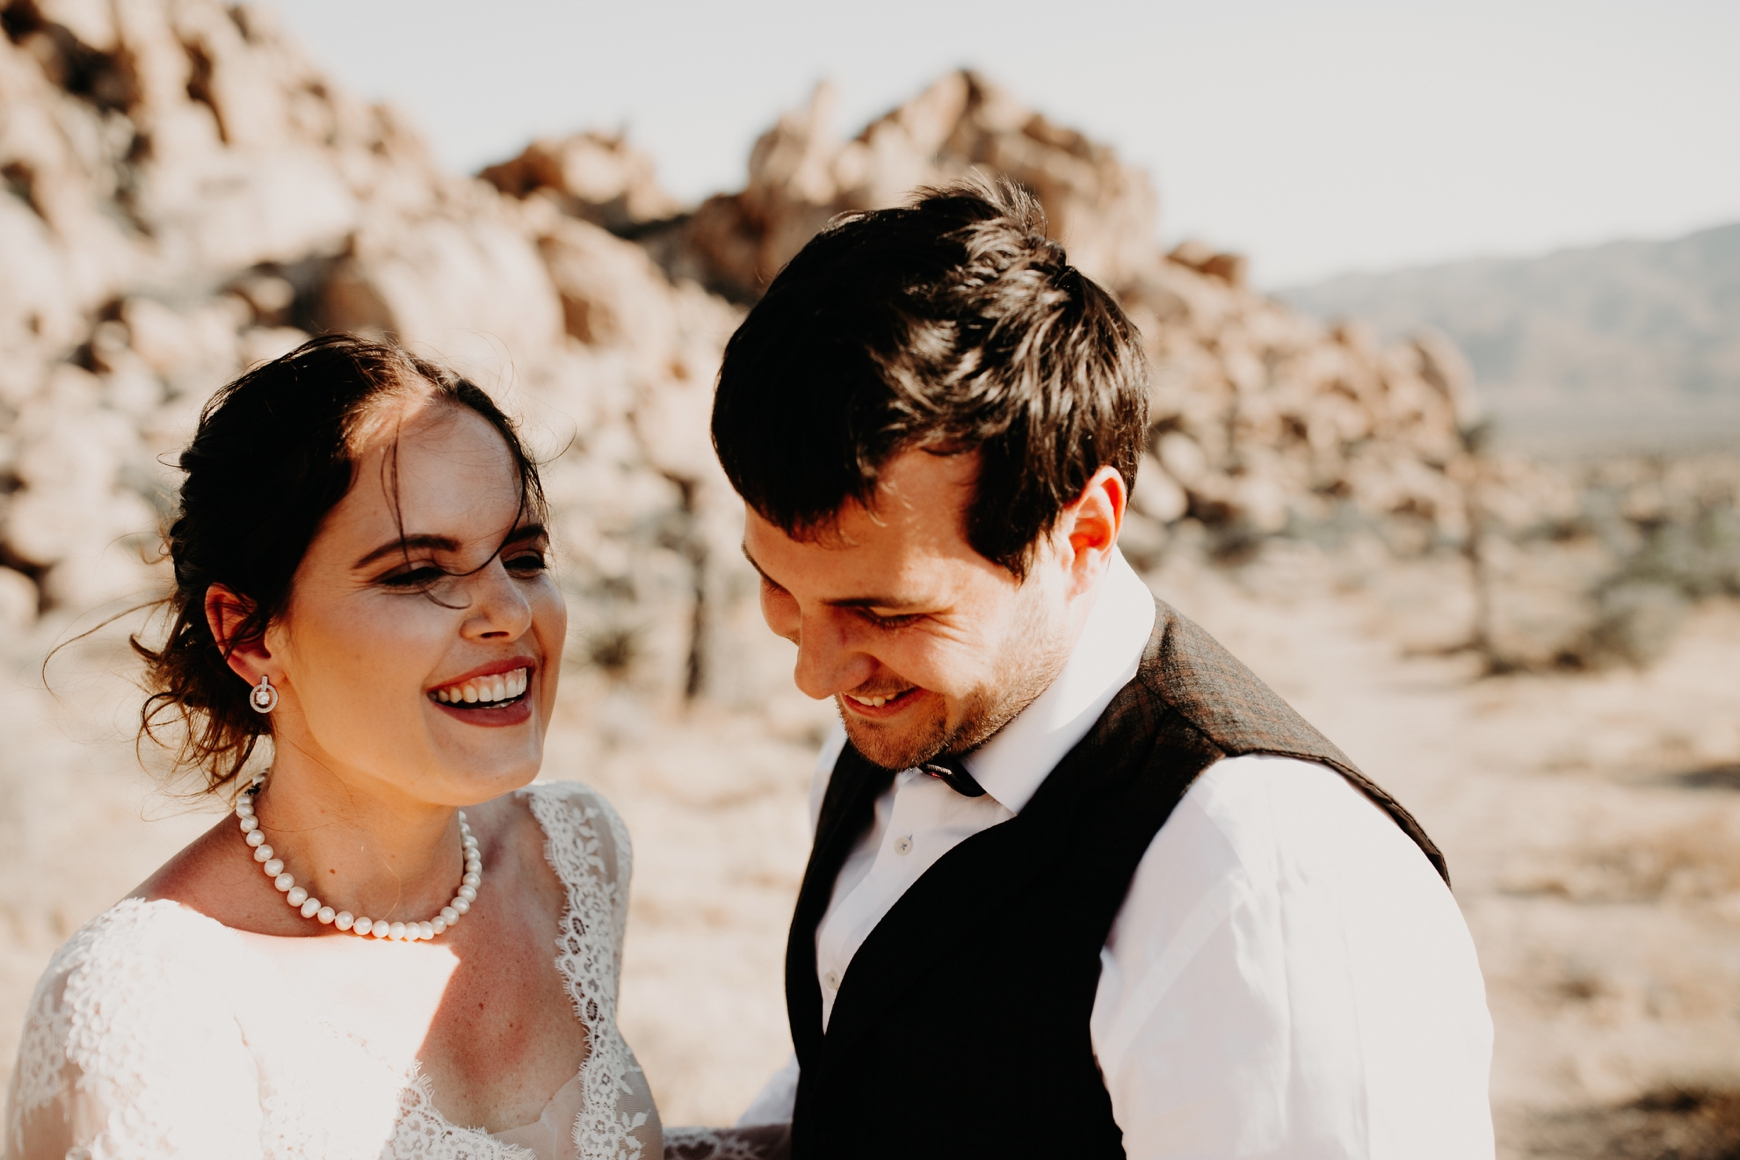 Joshua Tree Bridal Portraits Anastasia & Andrey Emily Magers Photography-5.jpg